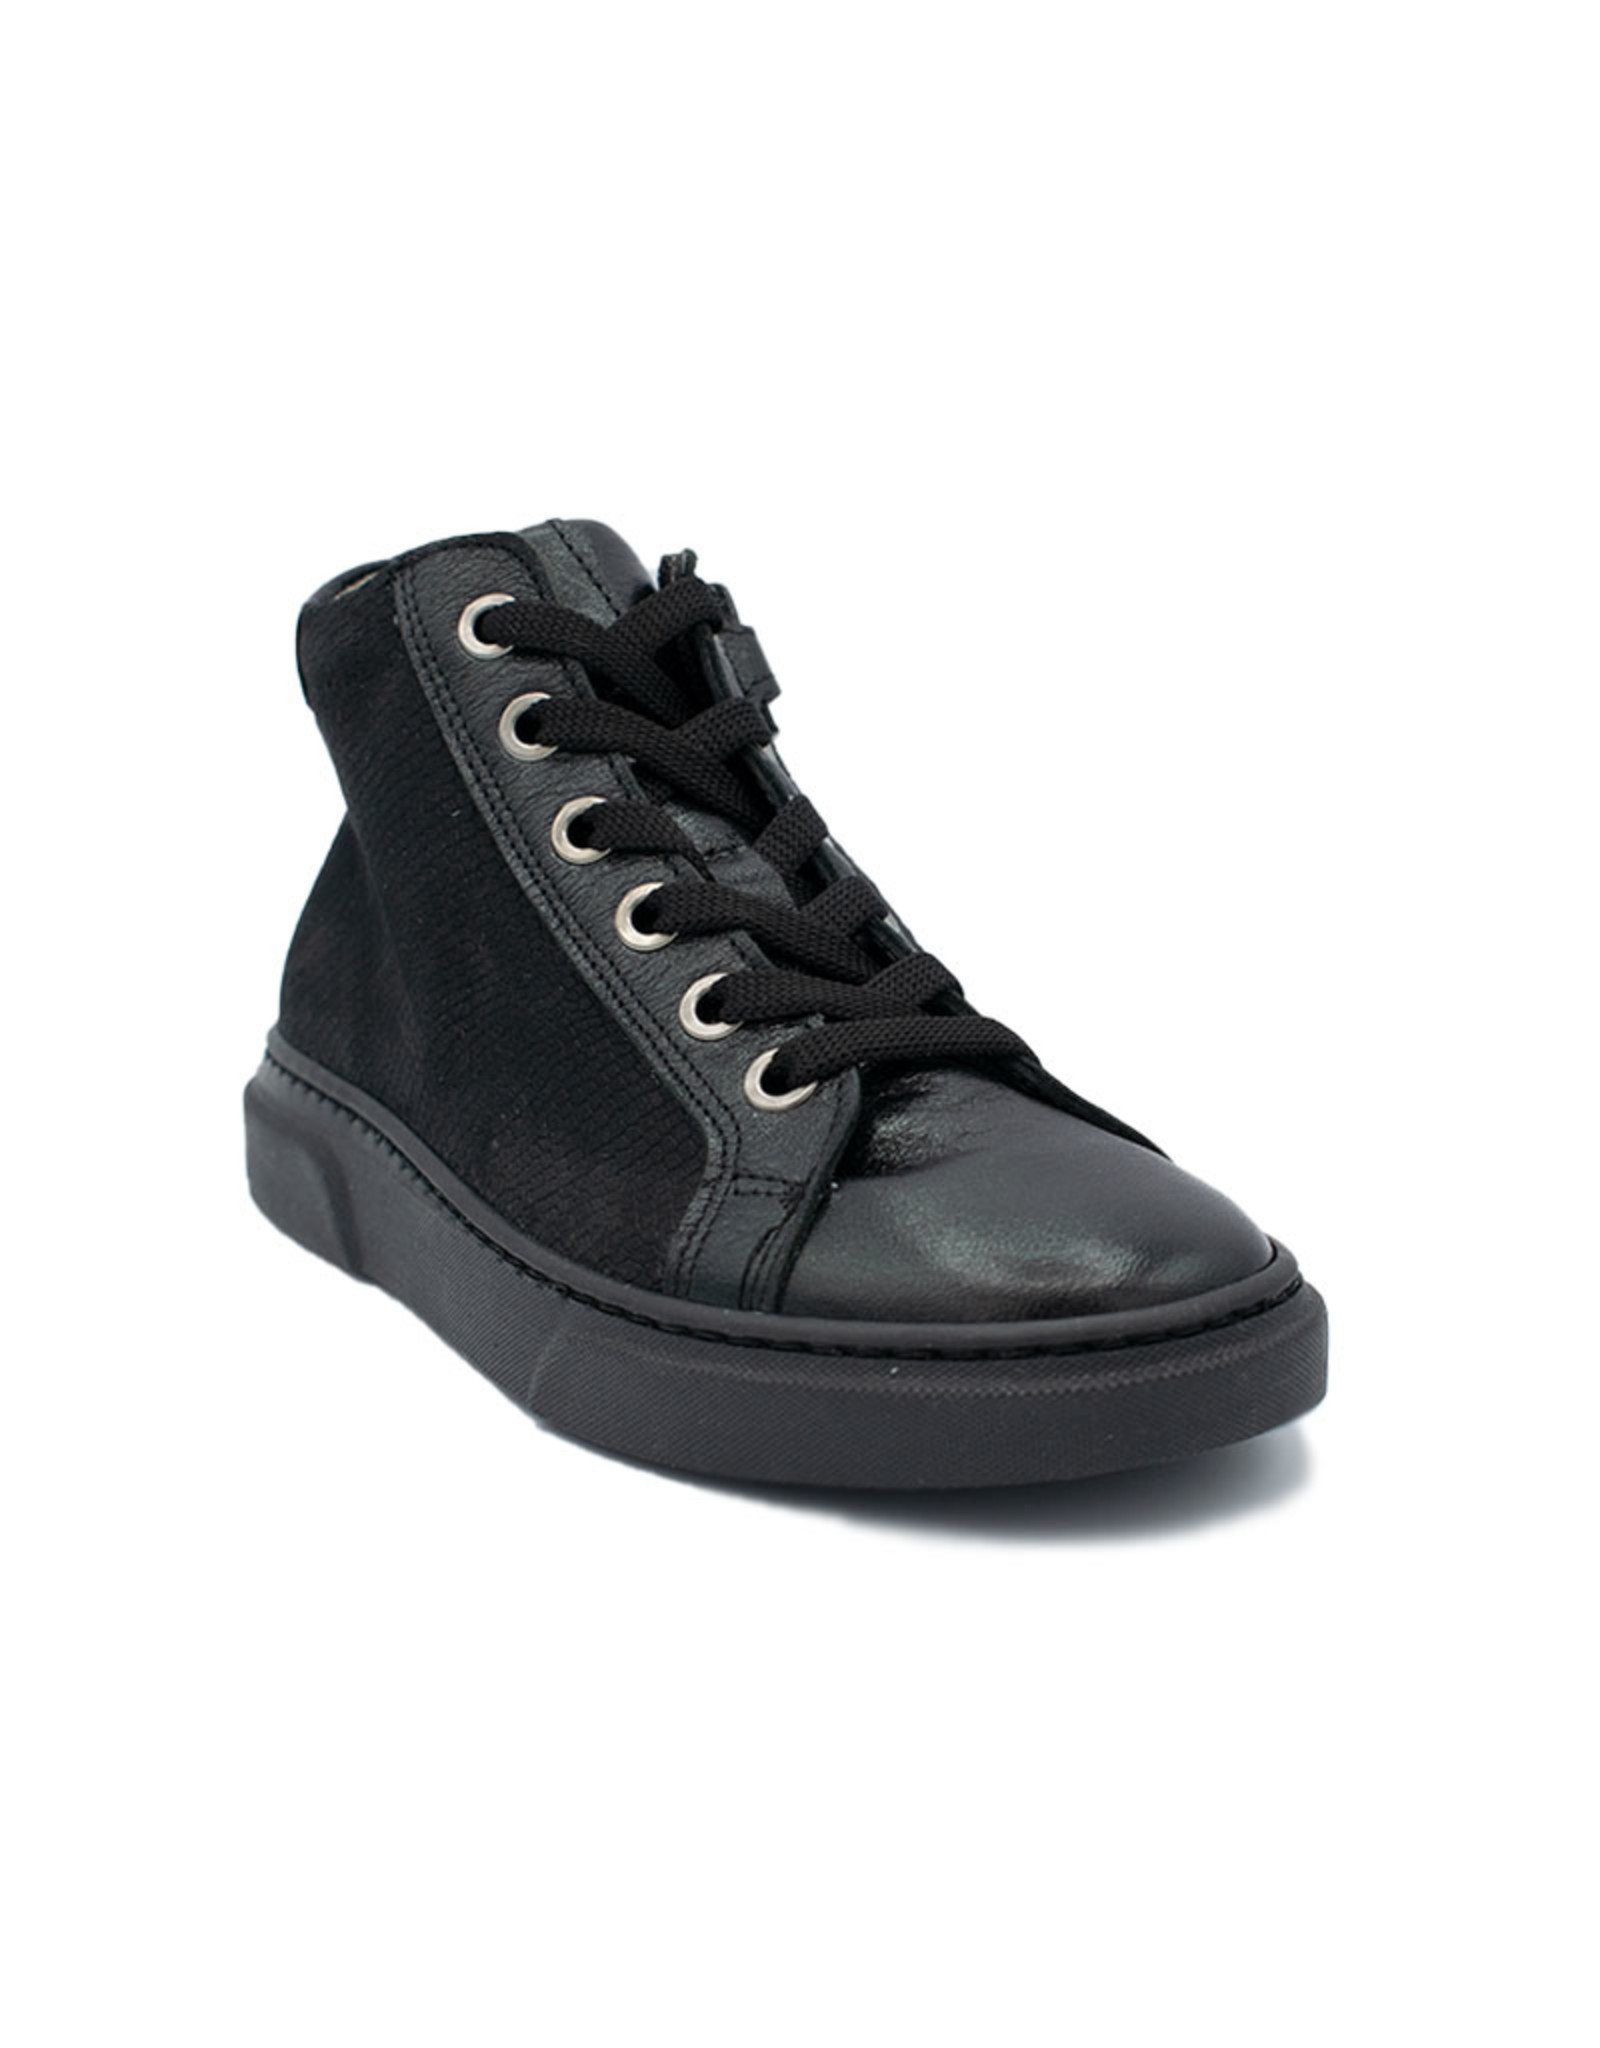 TRIBOO TRIBOO sneaker zwart